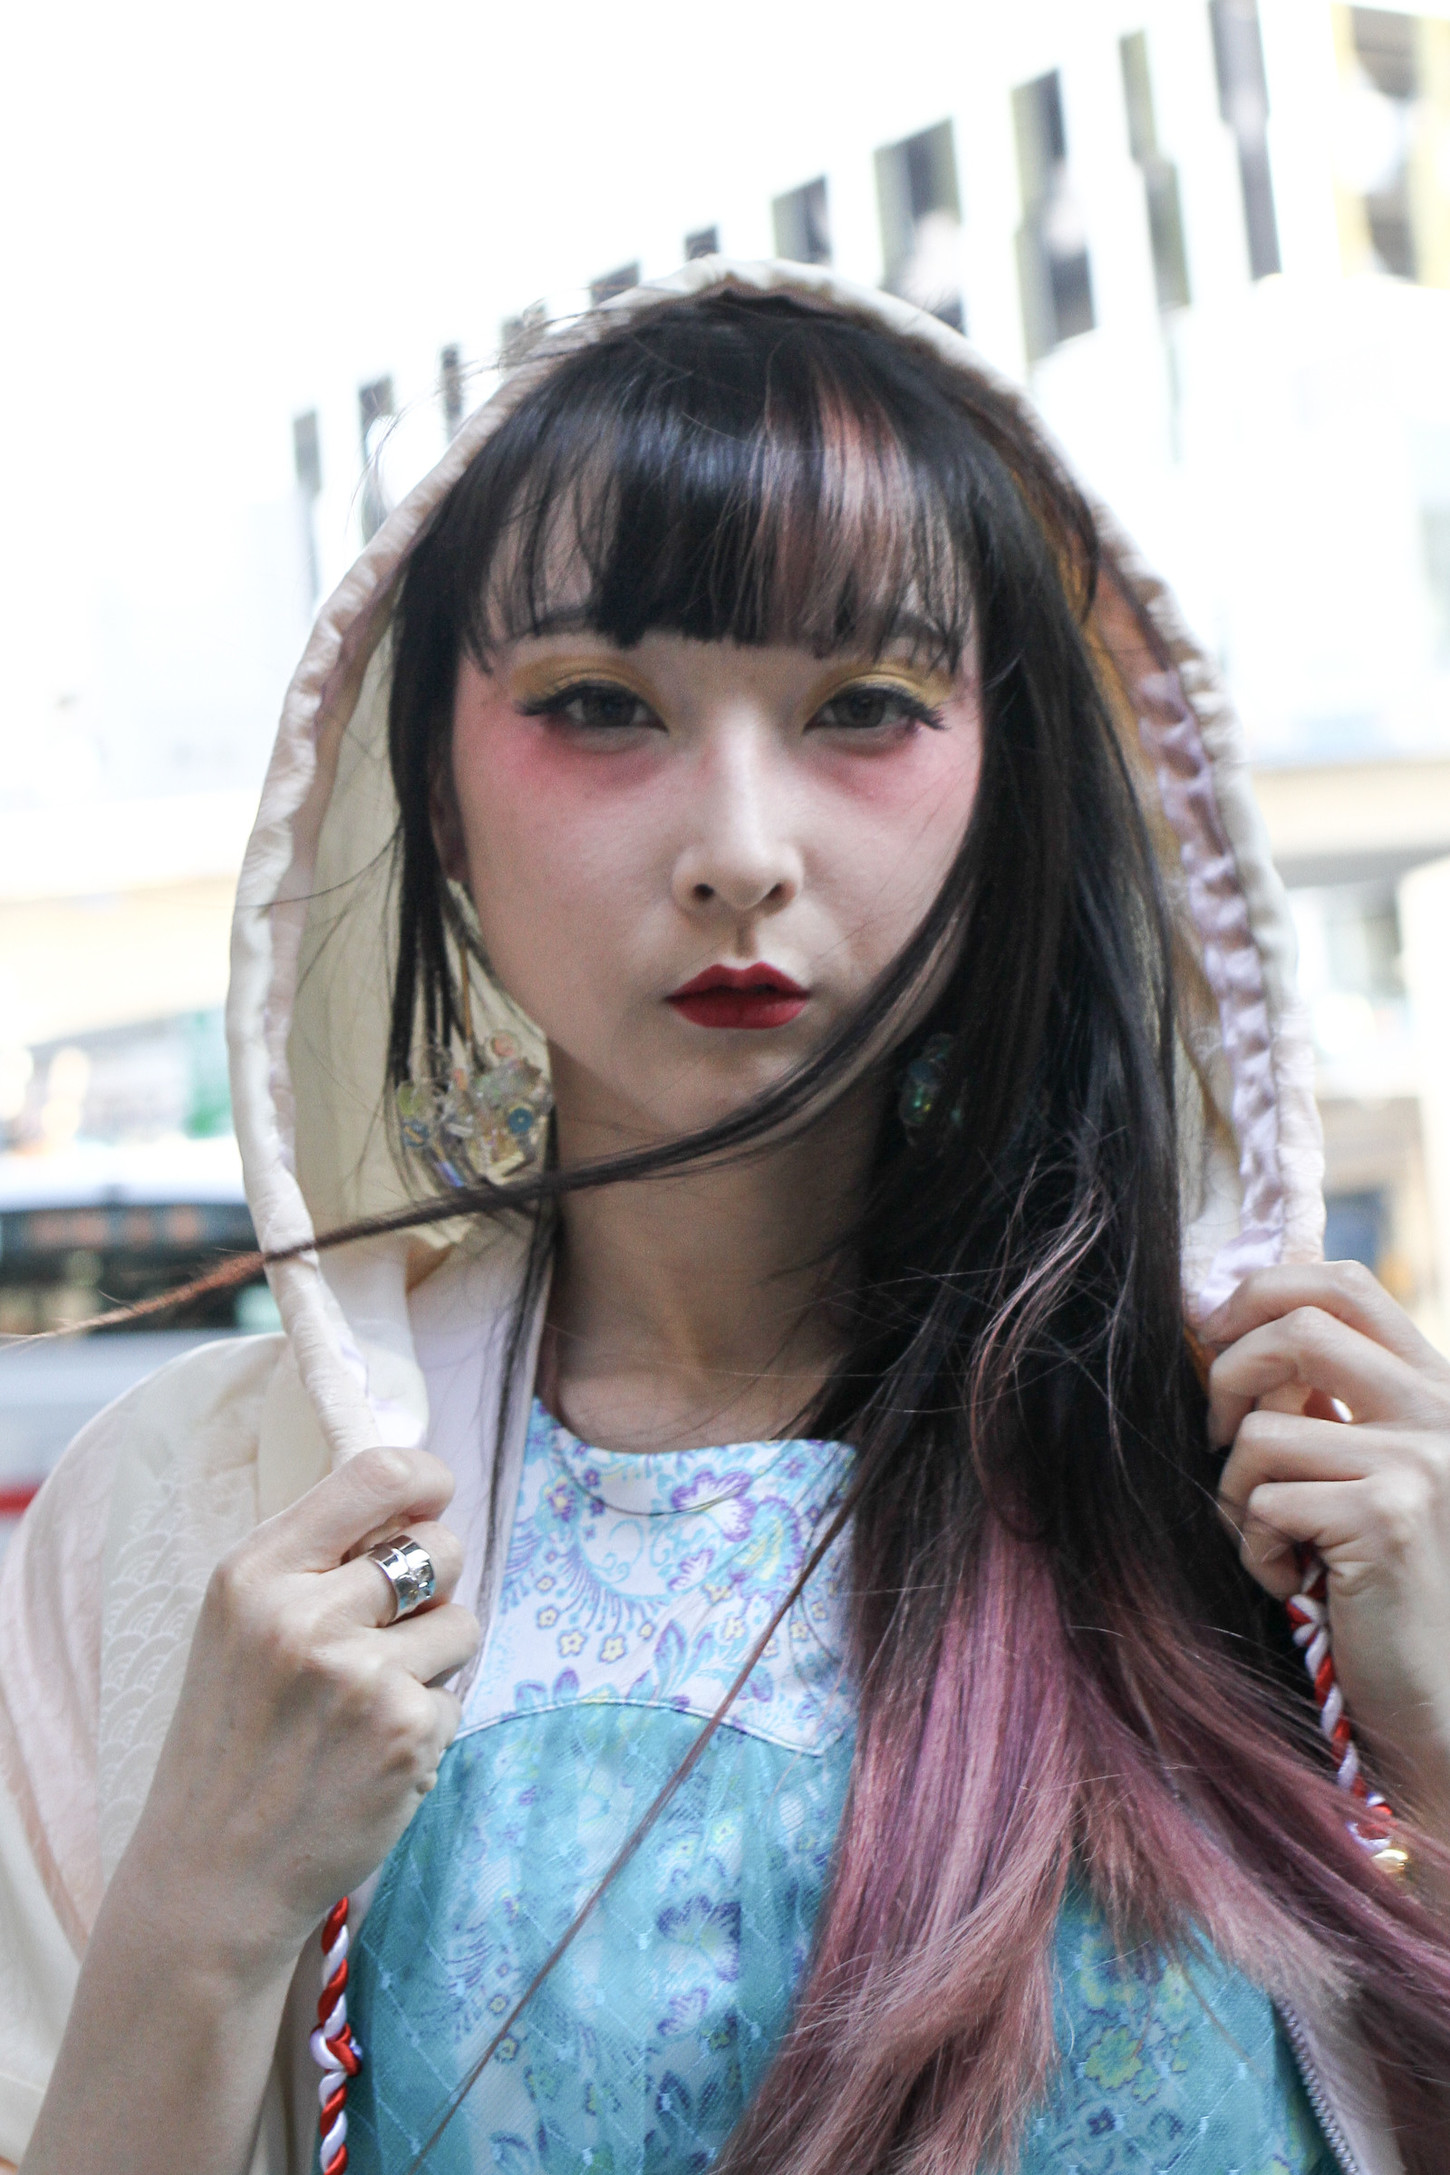 RinRin Doll